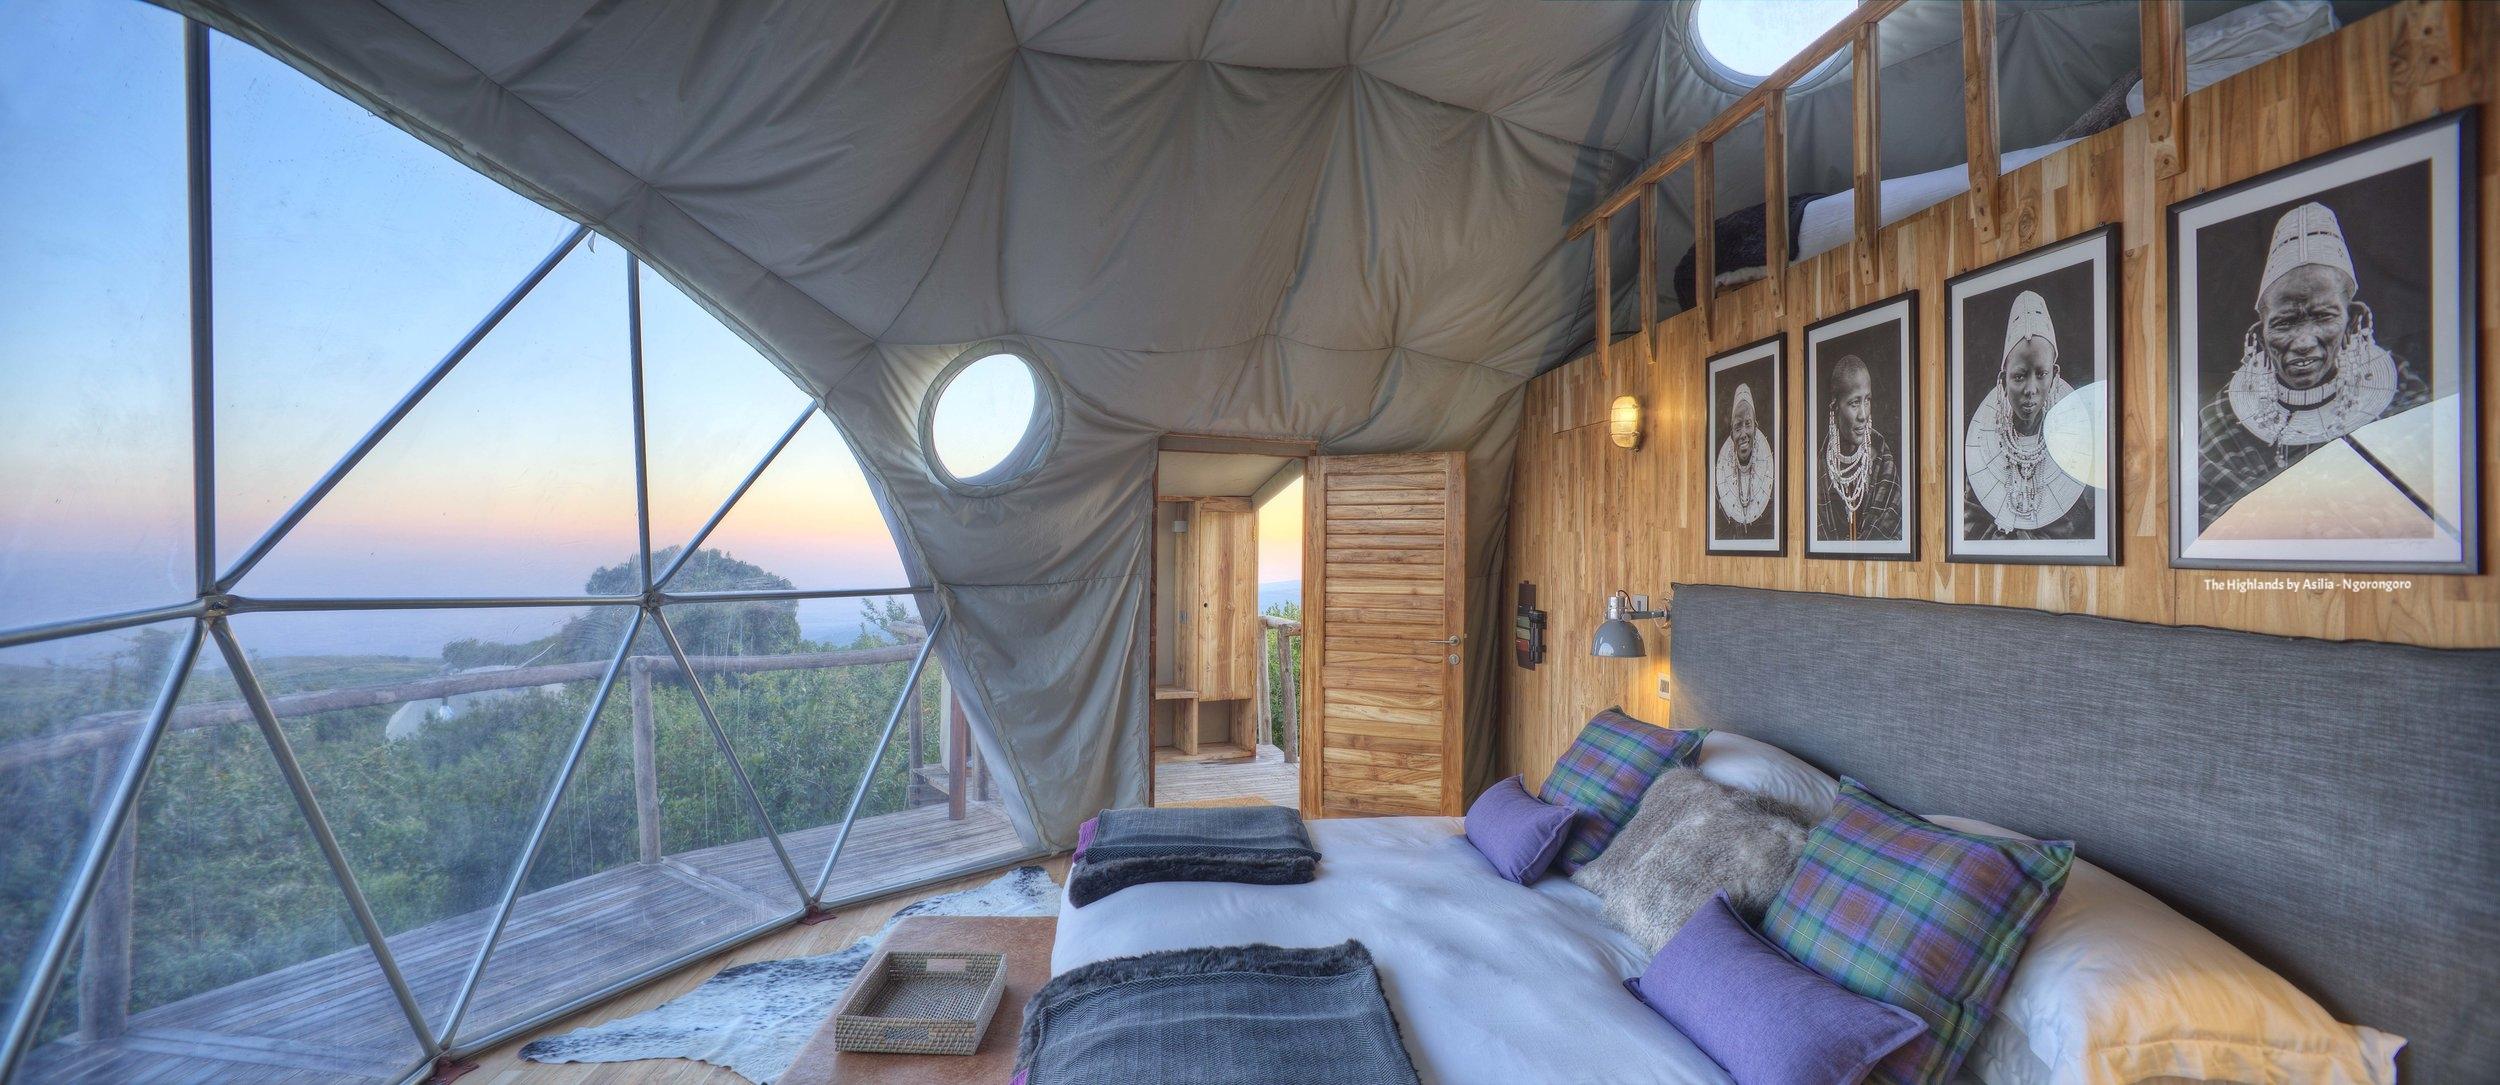 asilia_the_highlands_bedroom_takims_holidays.jpg